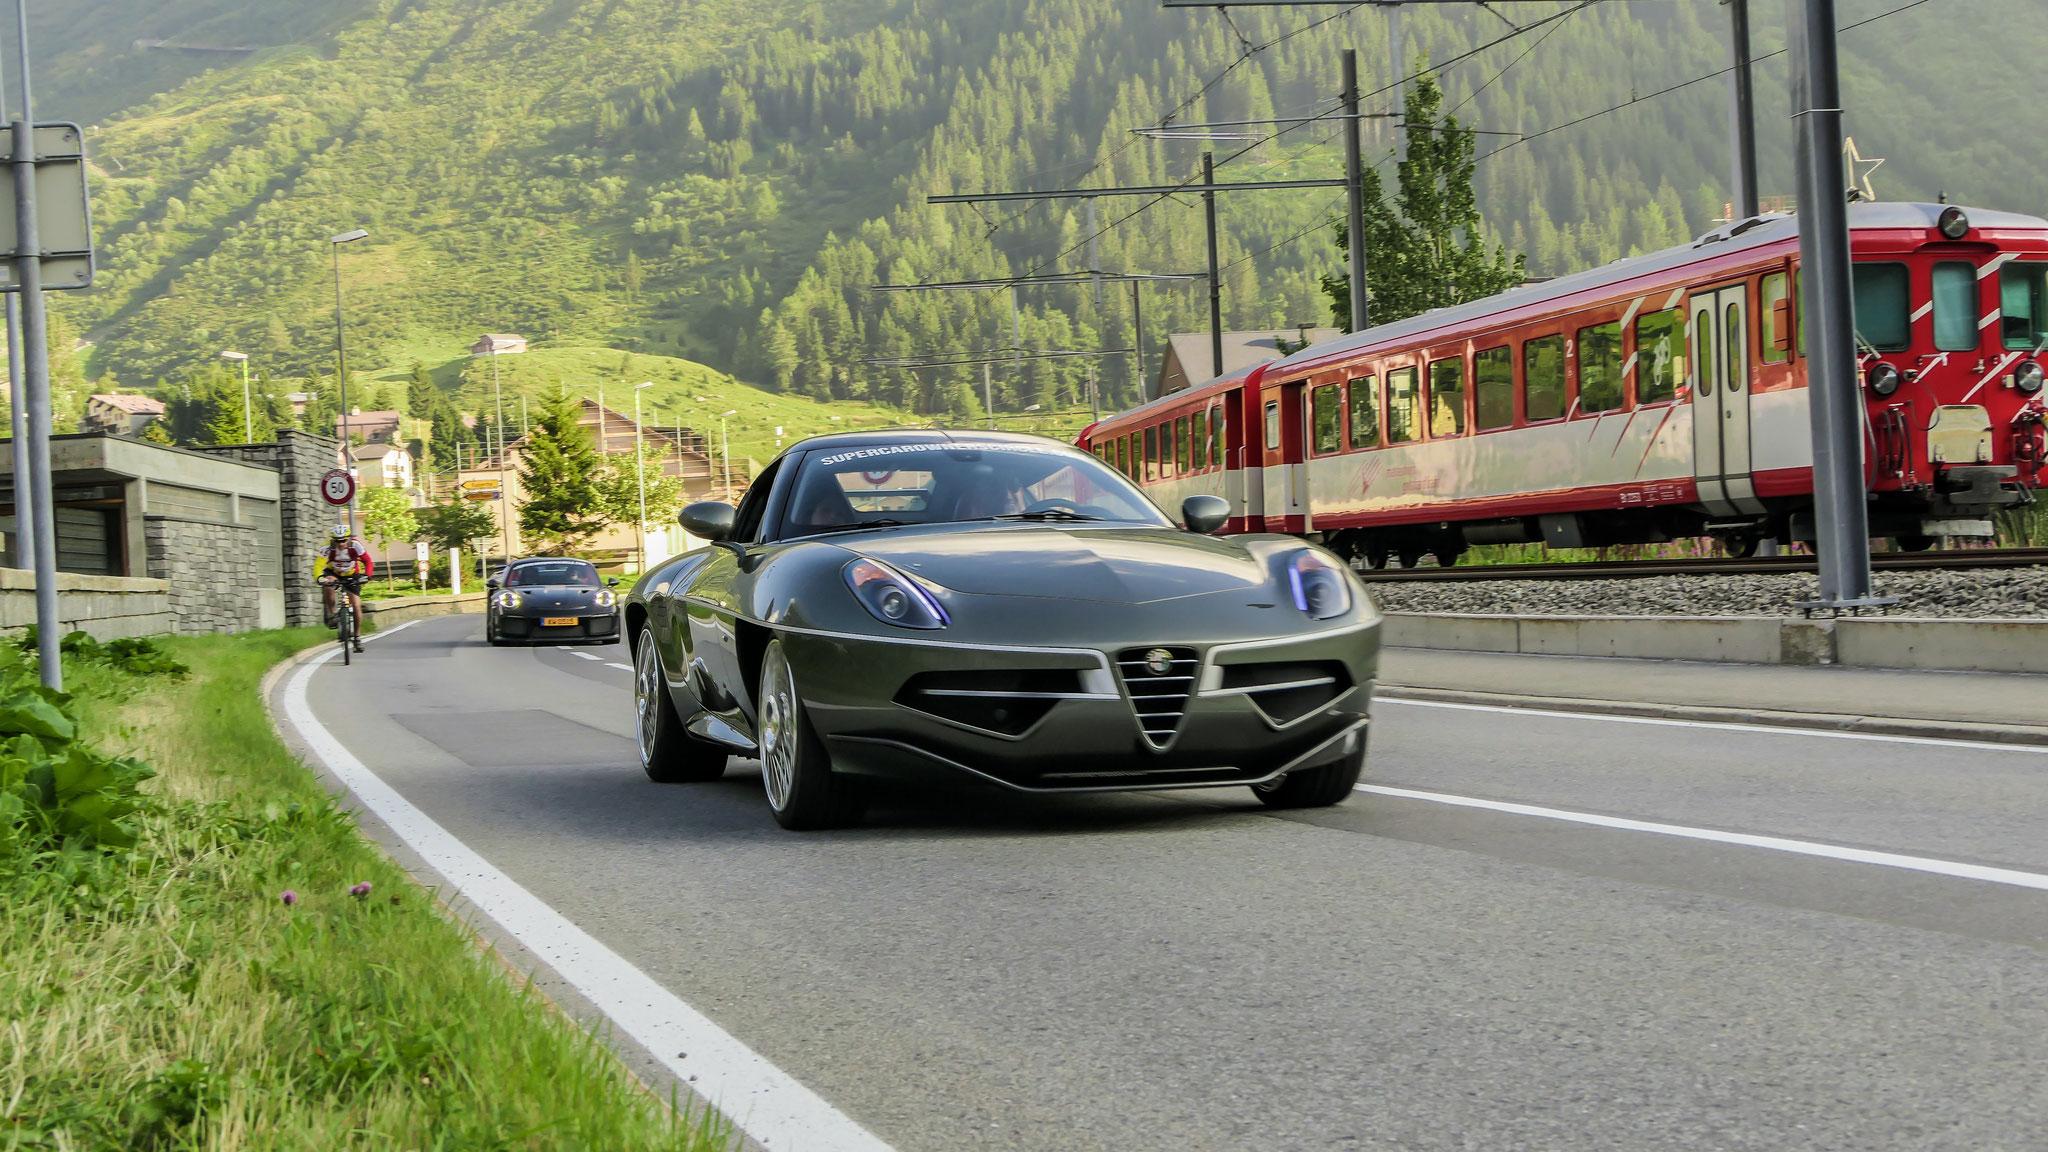 Alfa Romeo Disco Volante - EV-886-VW-75 (FRA)